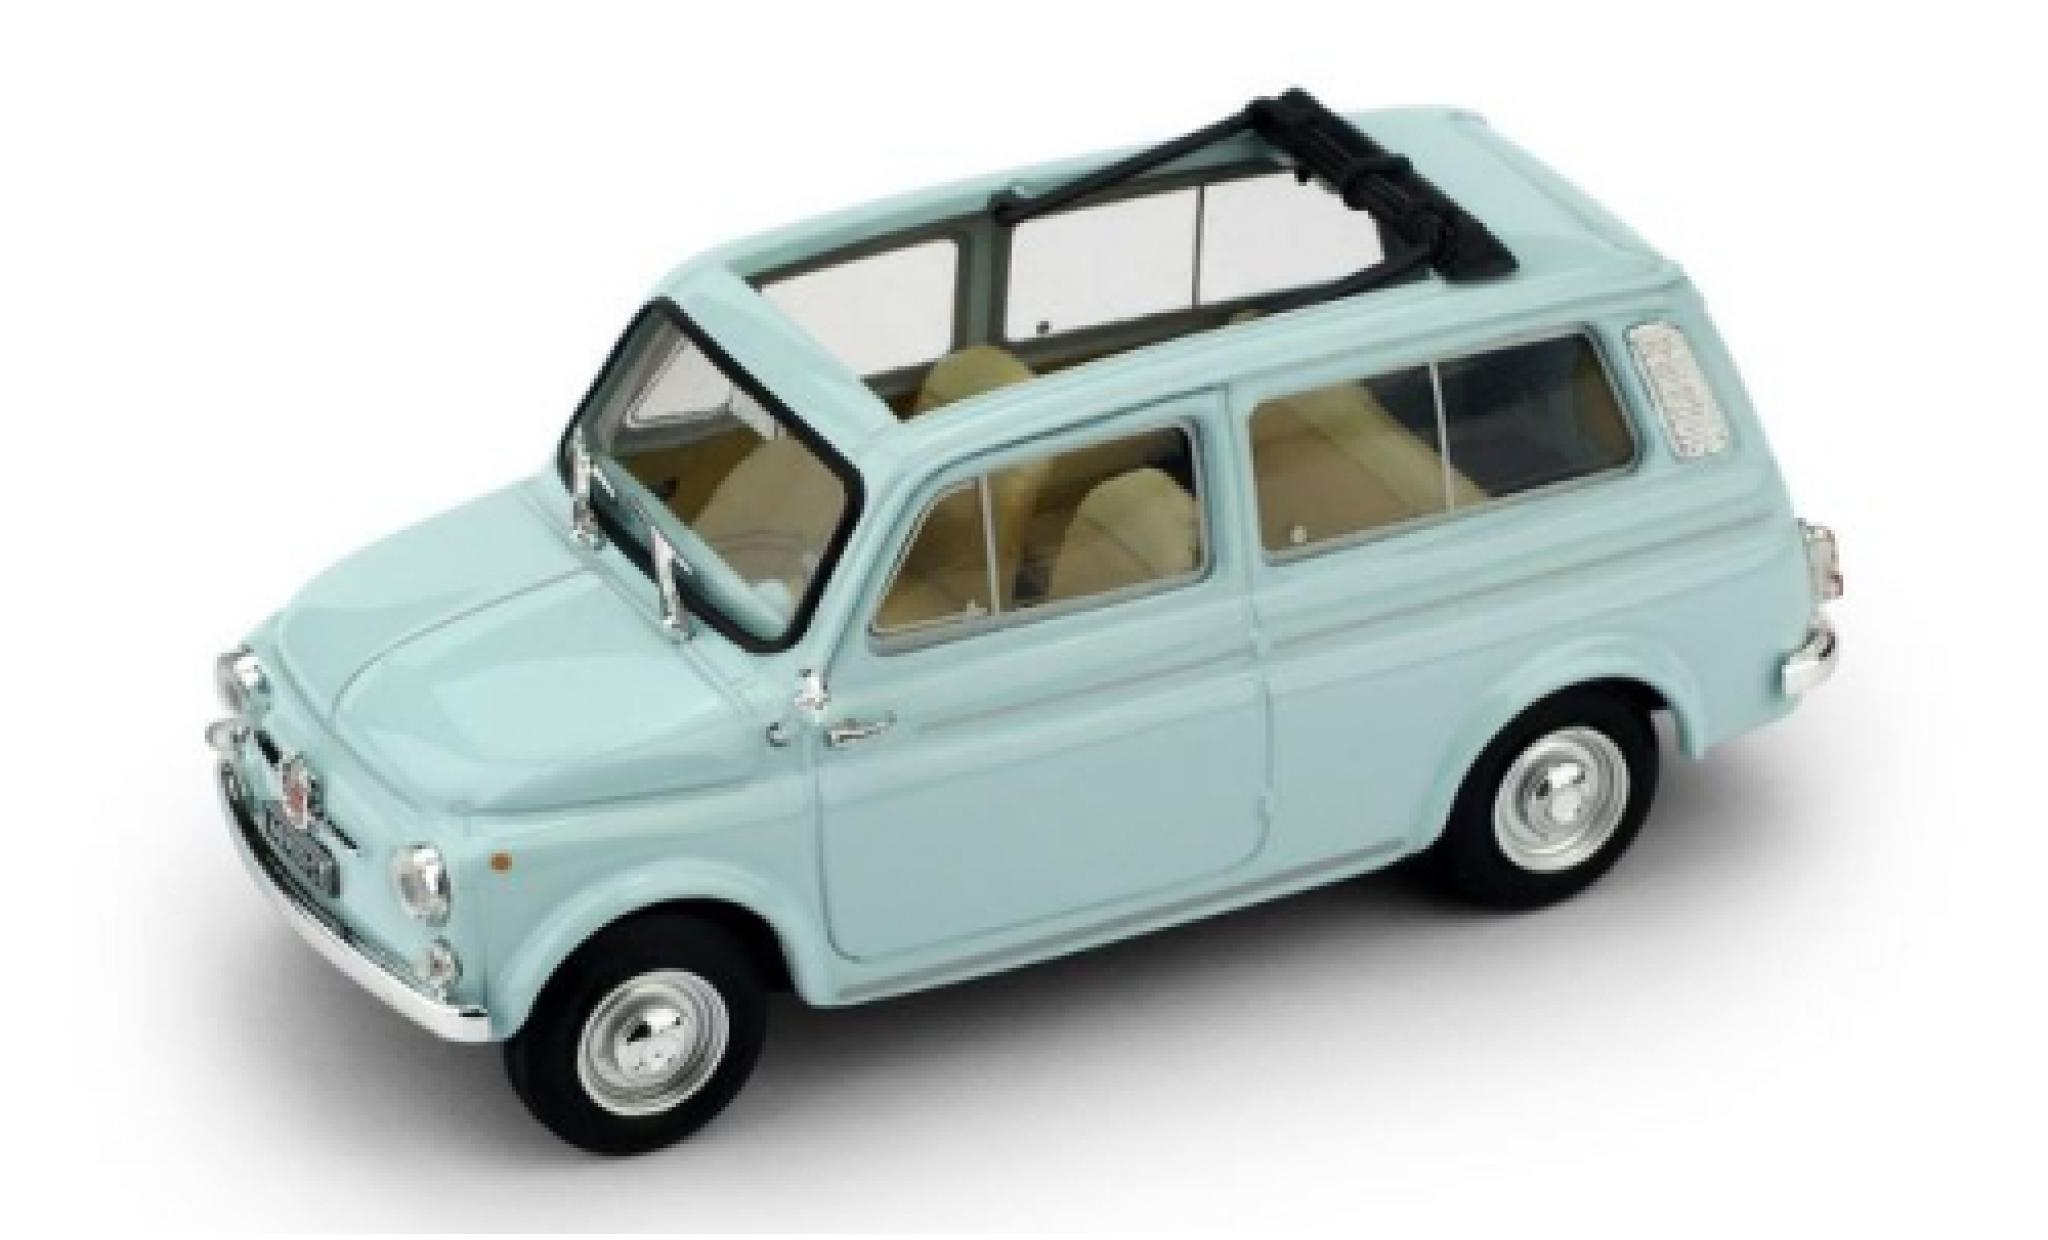 Fiat 500 1/43 Brumm Giardiniera blue 1960